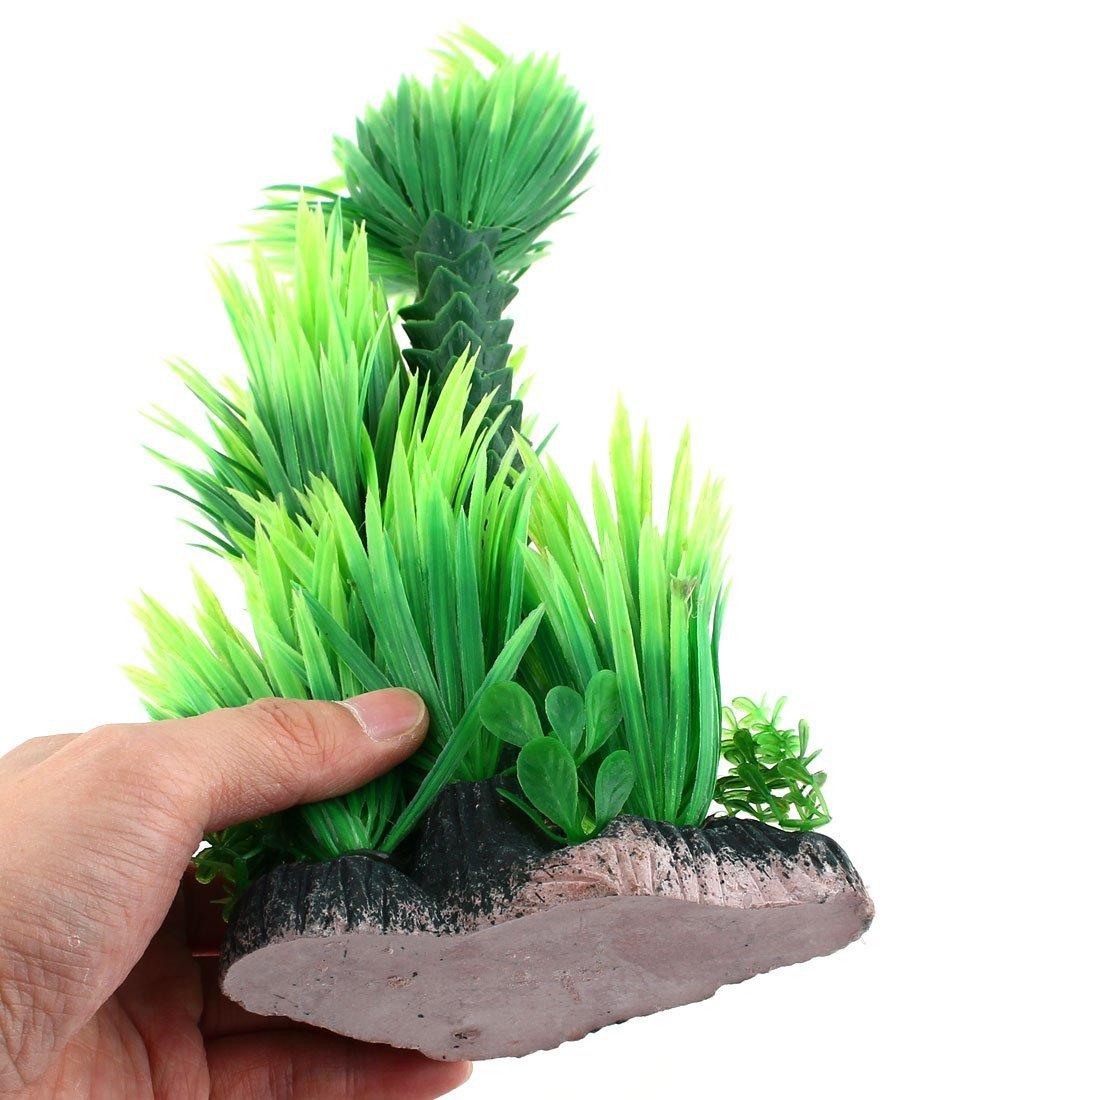 Amazon.com : eDealMax Planta de hierba cerámica acuario Base Artificial Paisaje Submarino 28cm Altura Verde : Pet Supplies